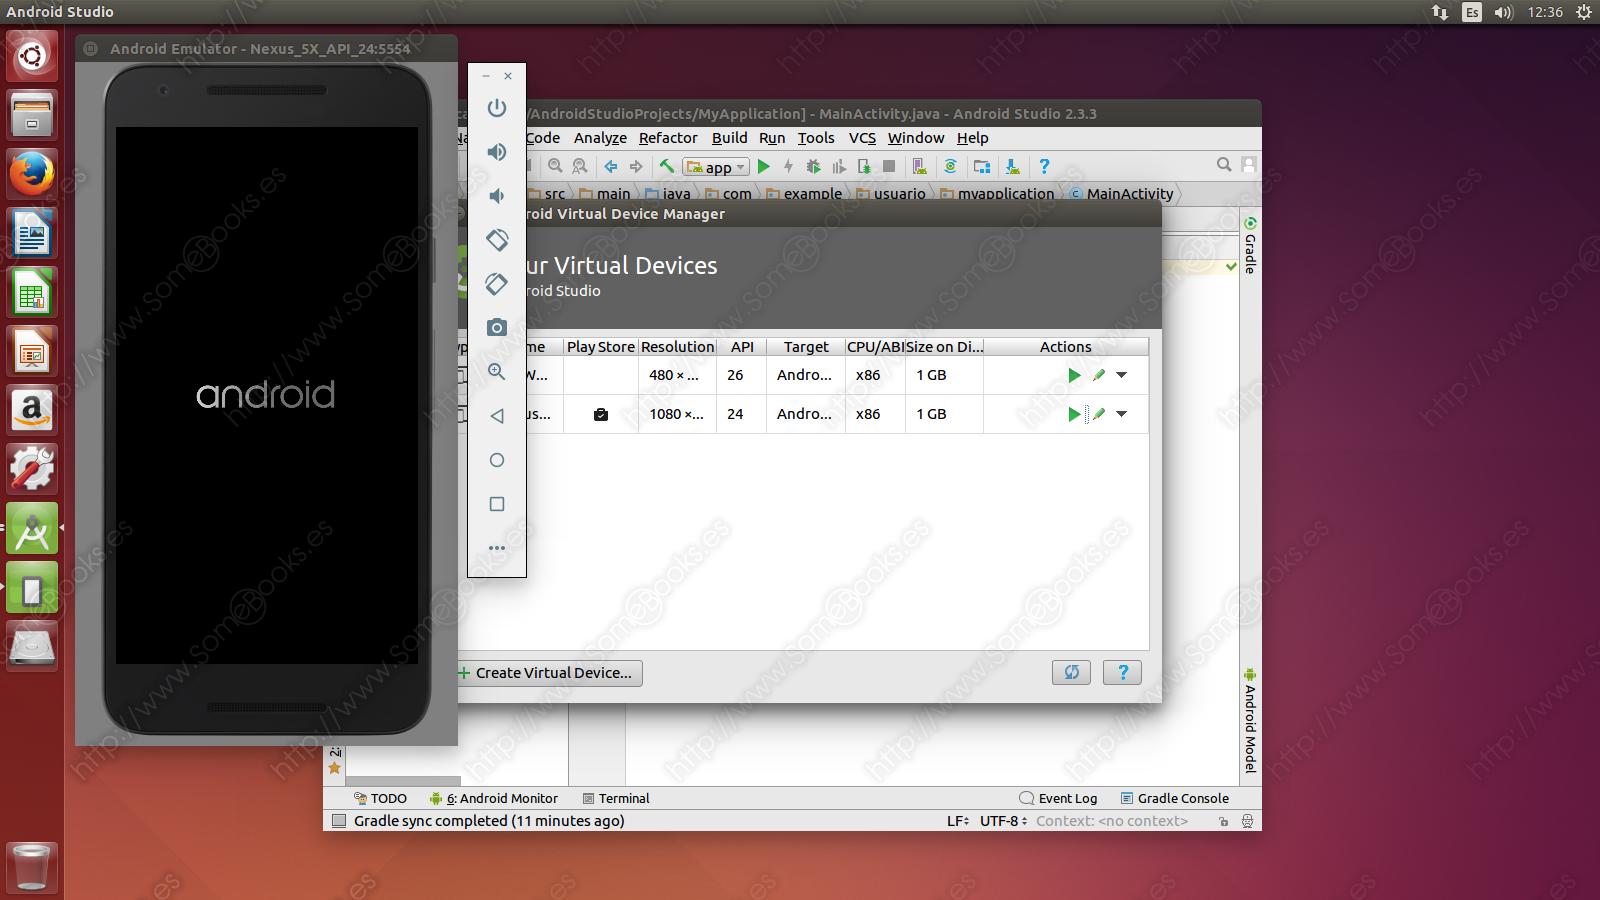 Crear-un-emulador-de-Android-con-Android-Studio-014